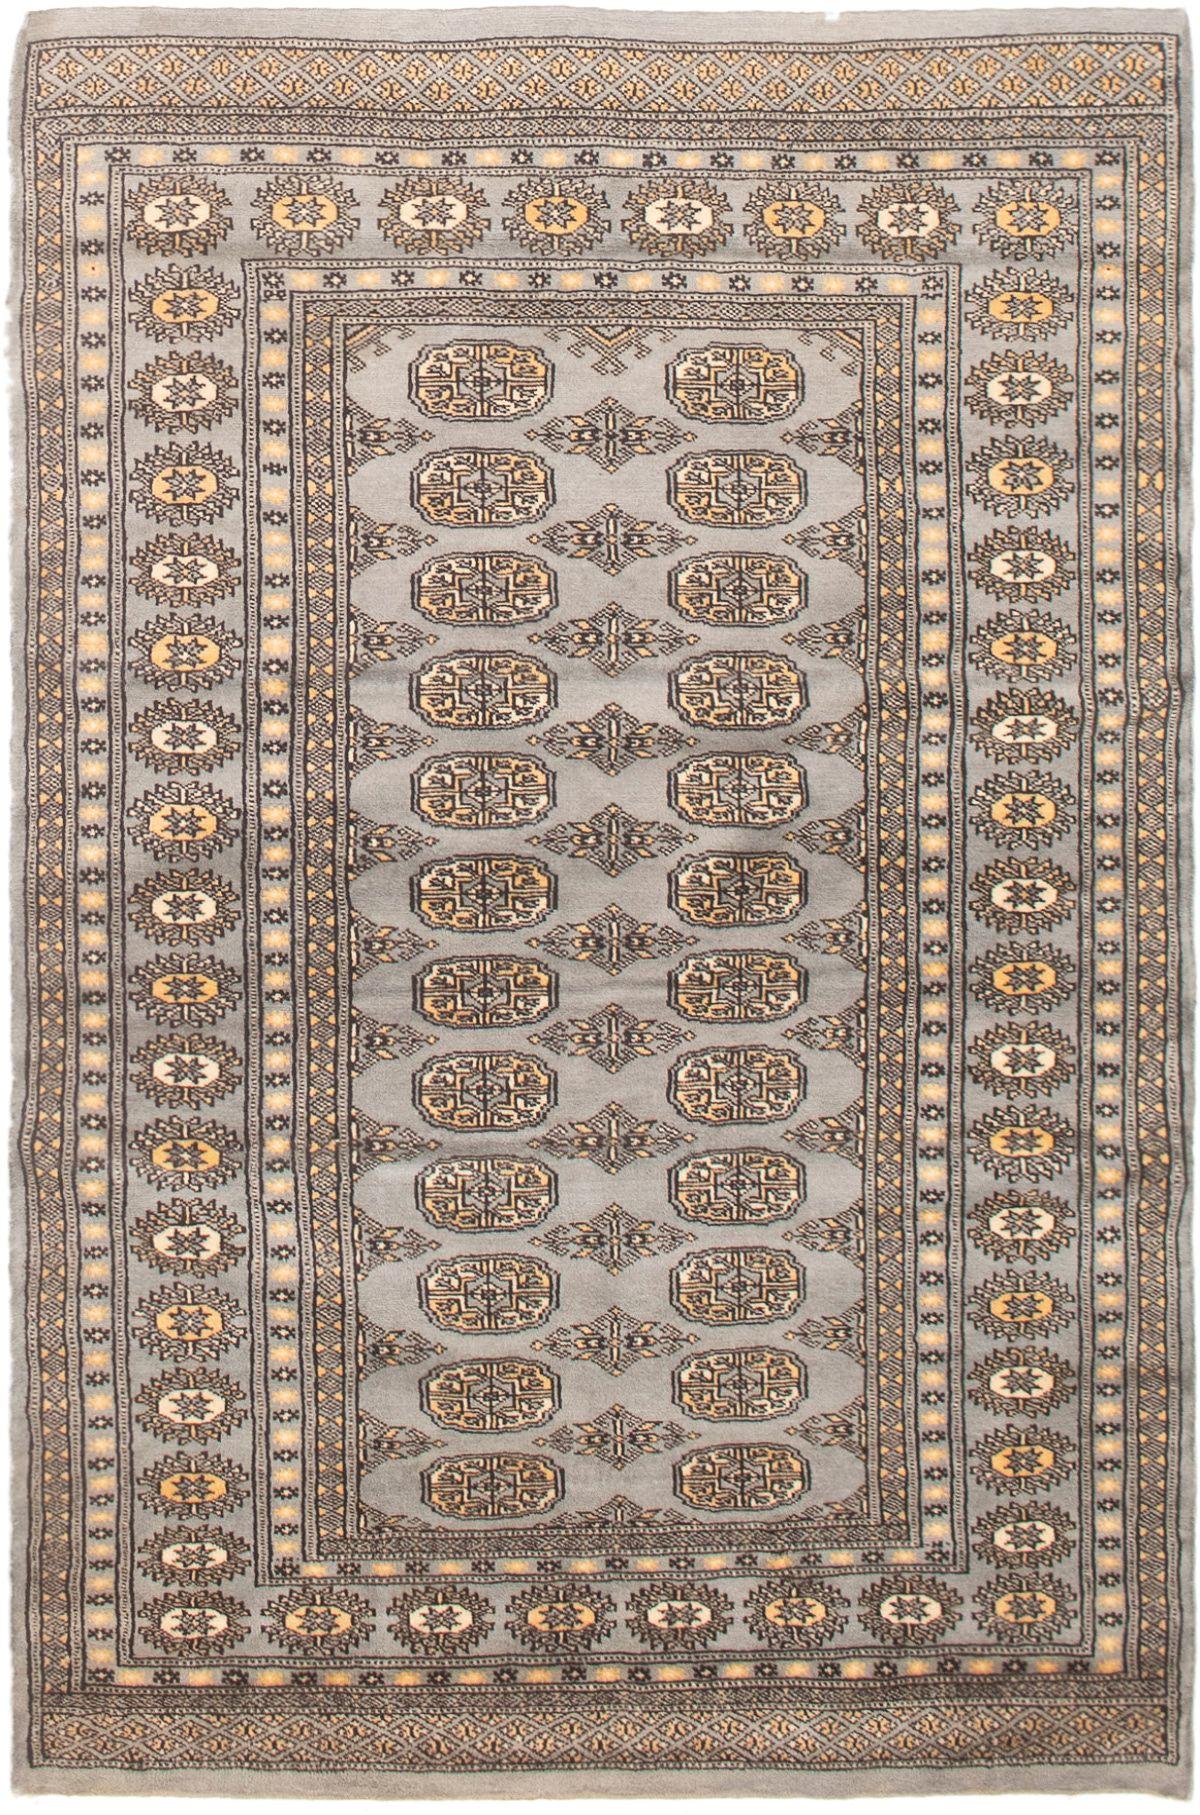 "Hand-knotted Finest Peshawar Bokhara Light Blue  Wool Rug 4'0"" x 6'2"" Size: 4'0"" x 6'2"""